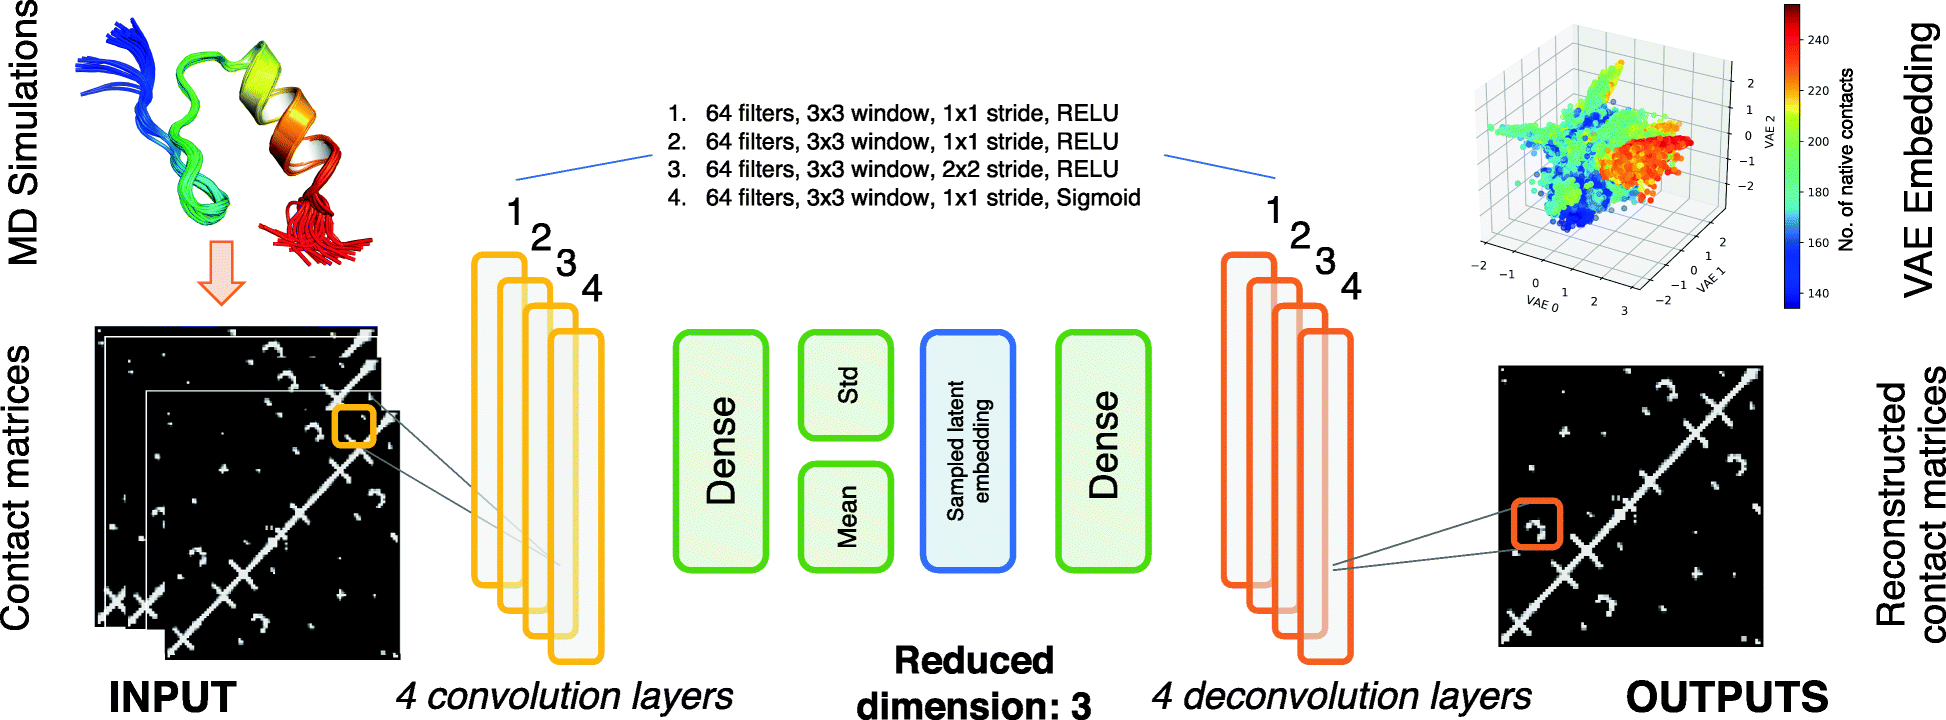 Deep clustering of protein folding simulations | SpringerLink